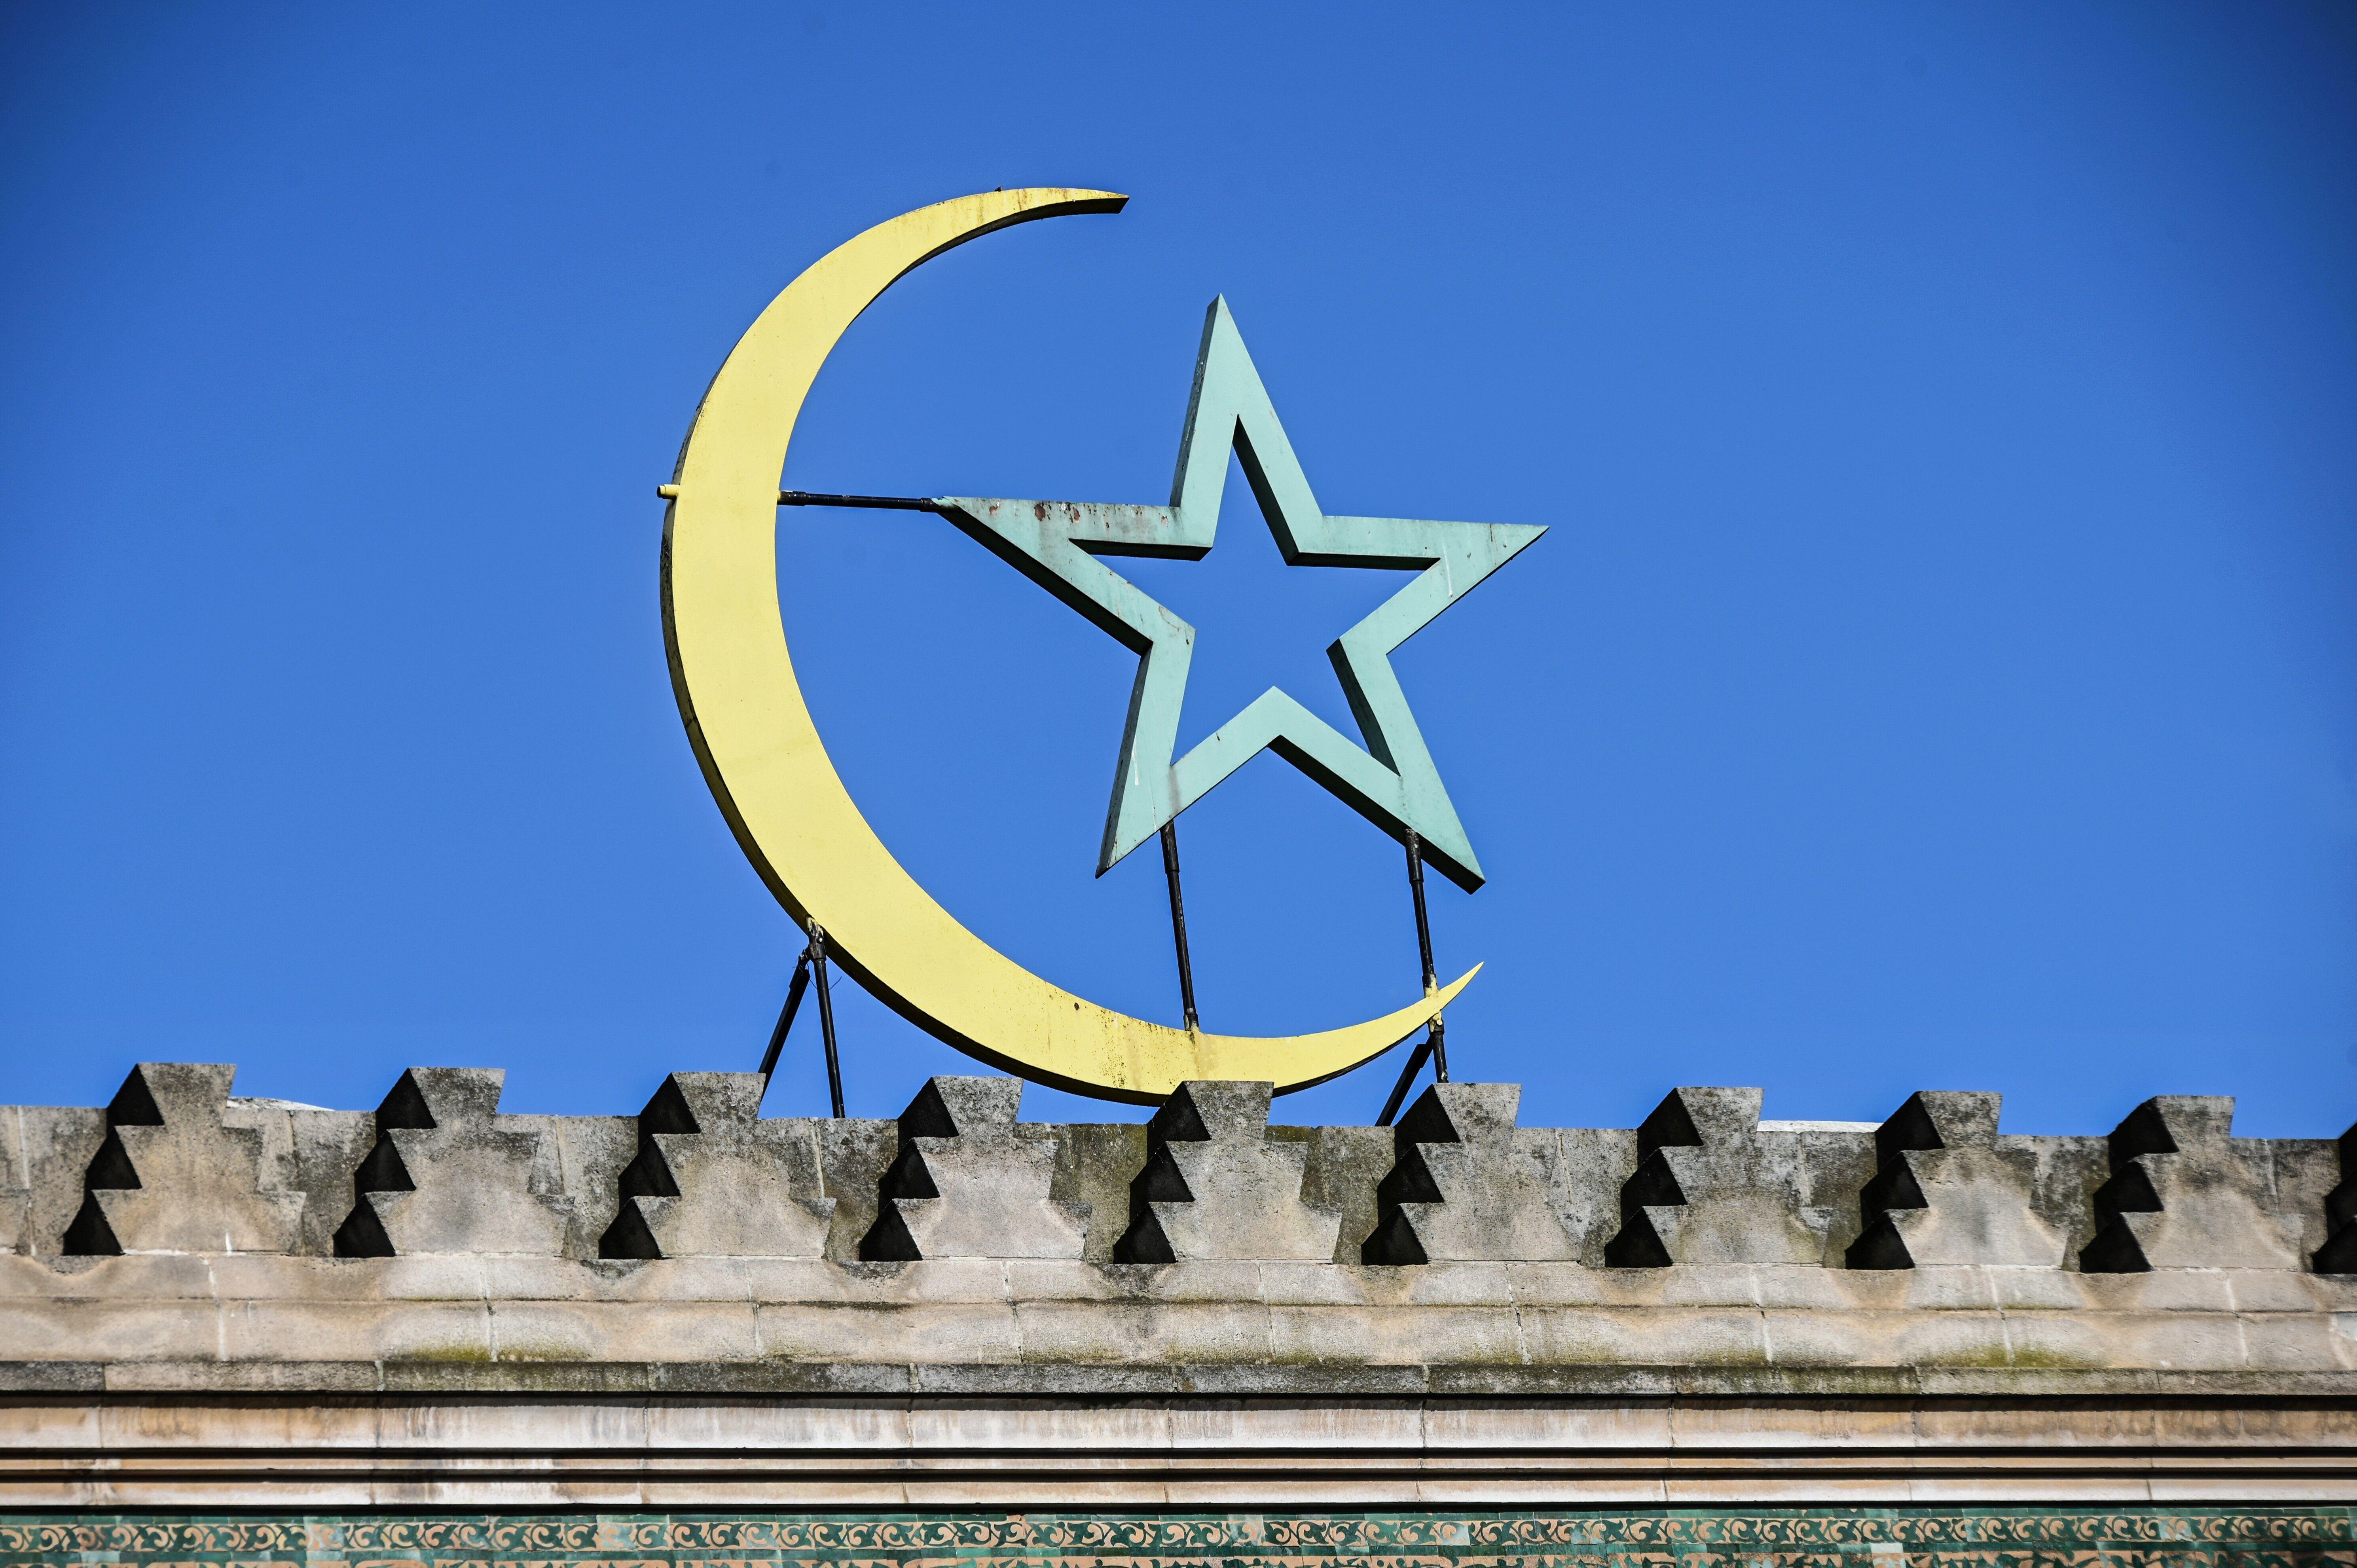 Le ramadan commencera vendredi en France